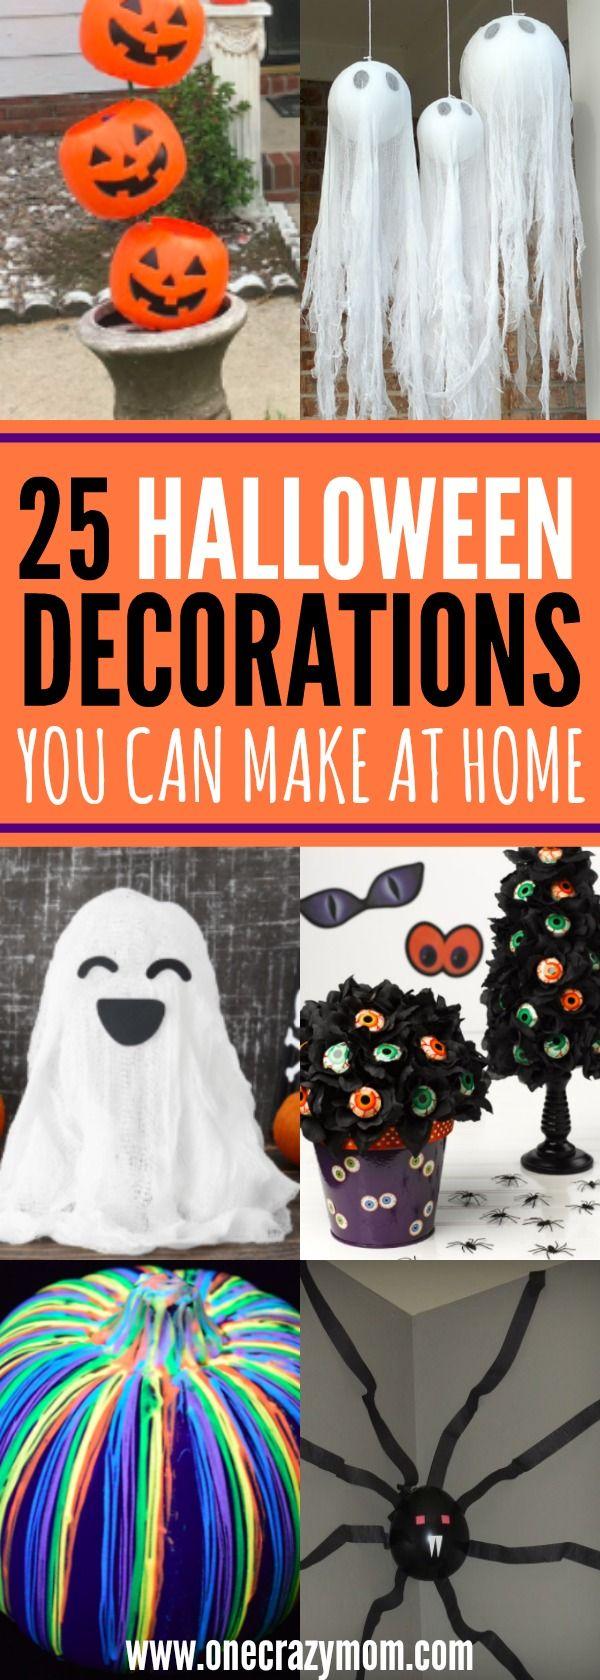 Diy halloween decor pinterest - Diy Halloween Decoration Ideas 25 Budget Friendly Ideas